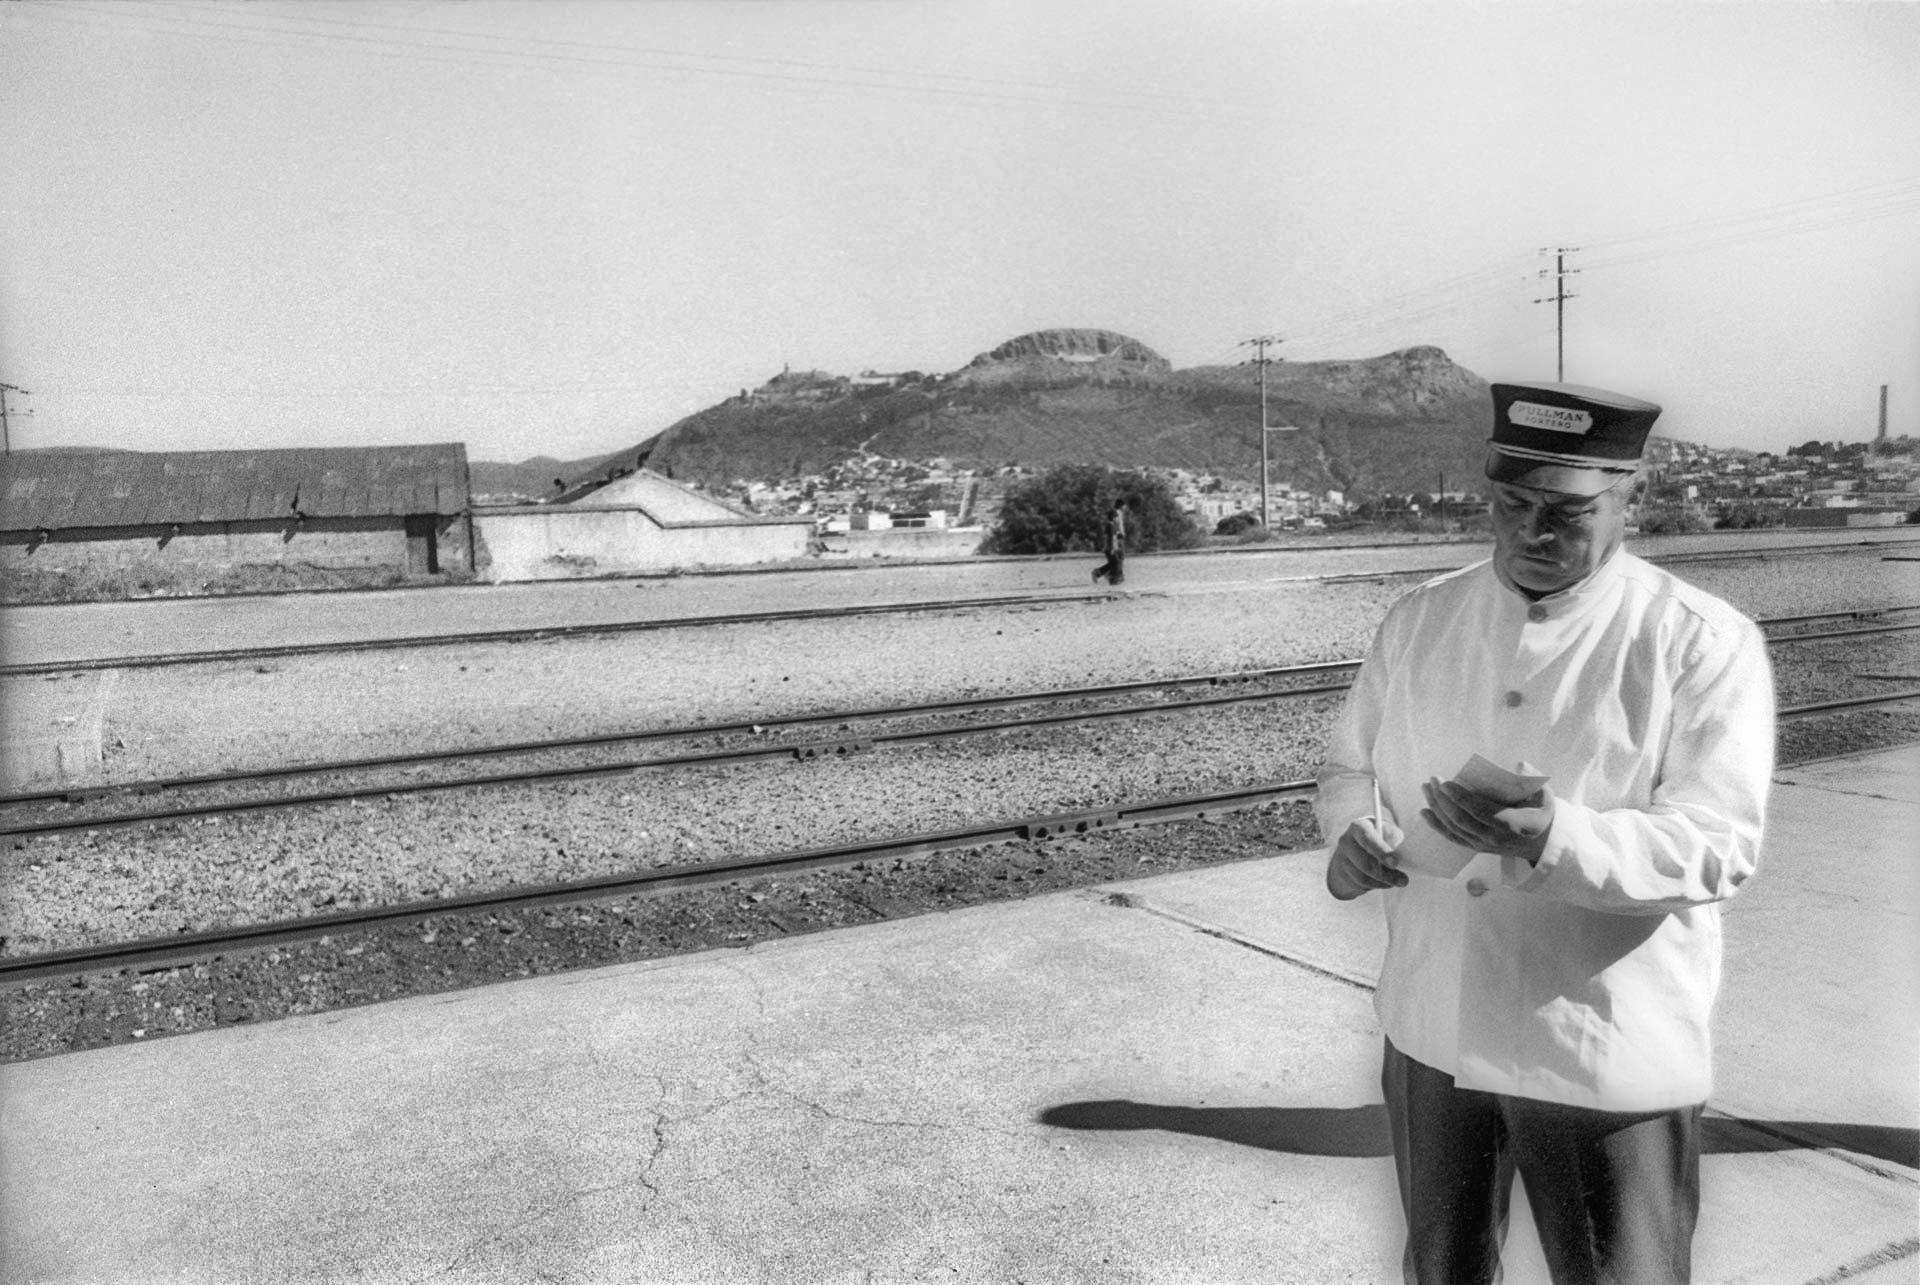 Erste Klasse Schaffner – First class conductor